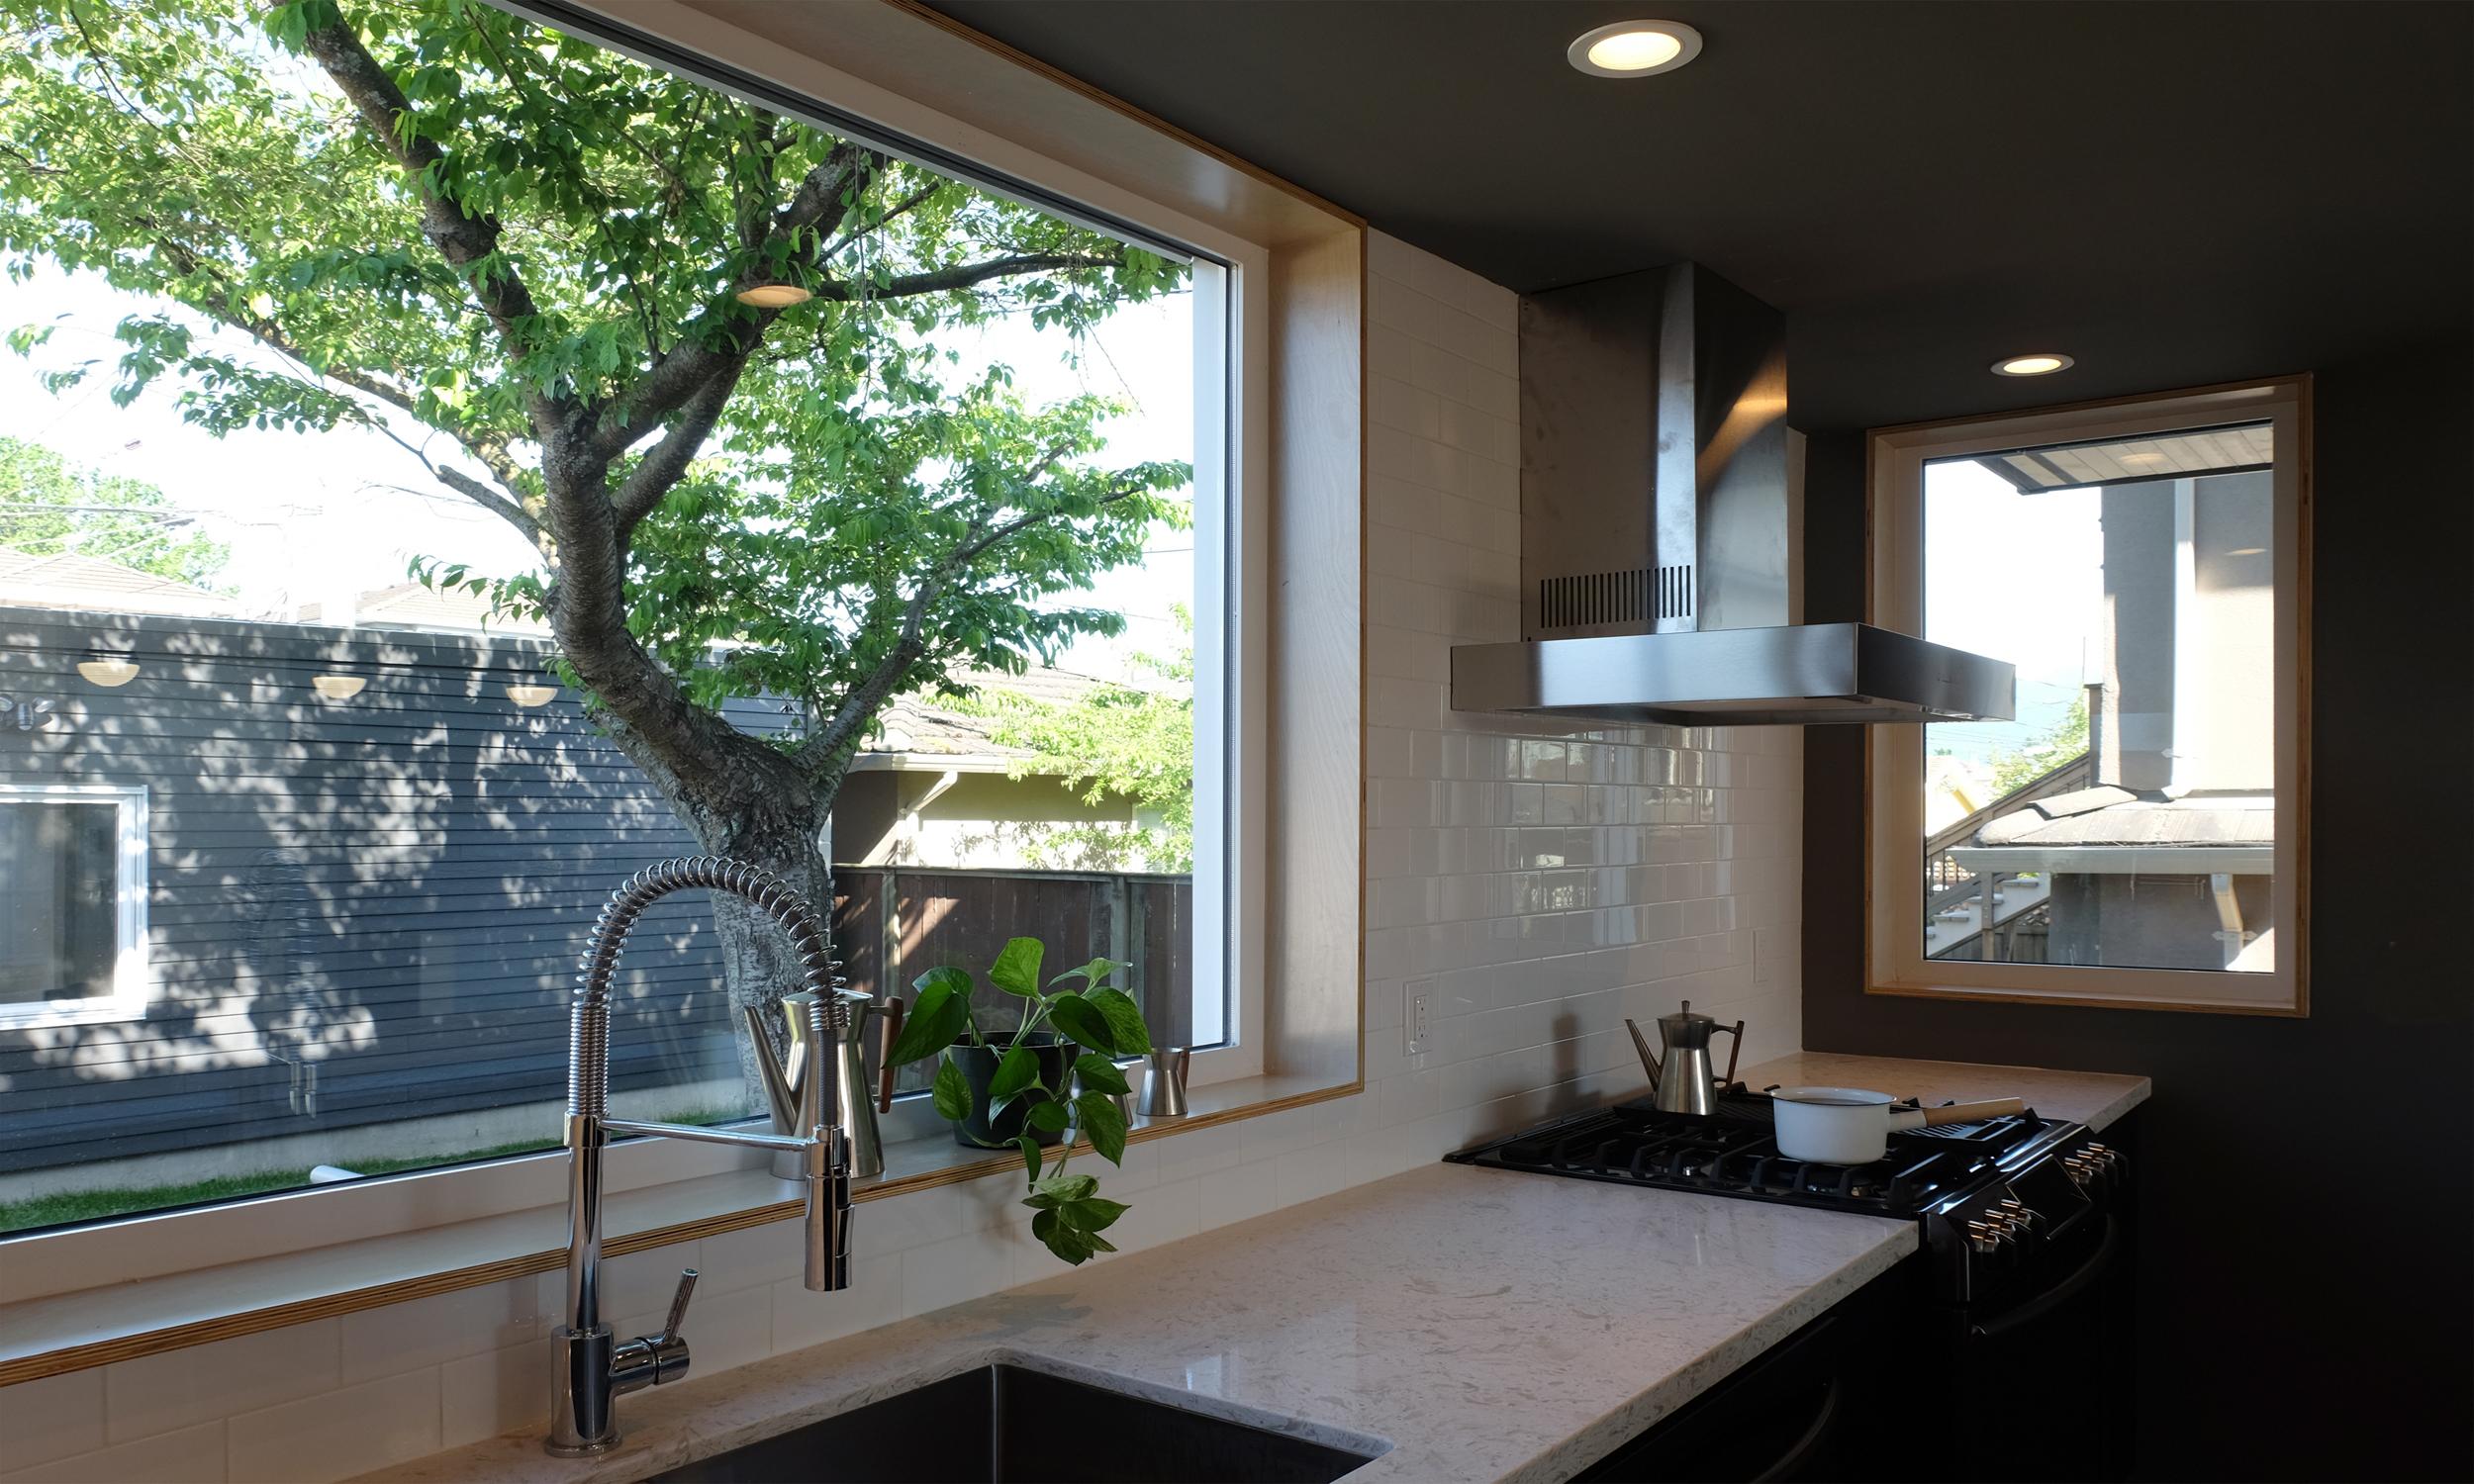 FSOARK Windermere Kitchen-6 2500x1500.jpg